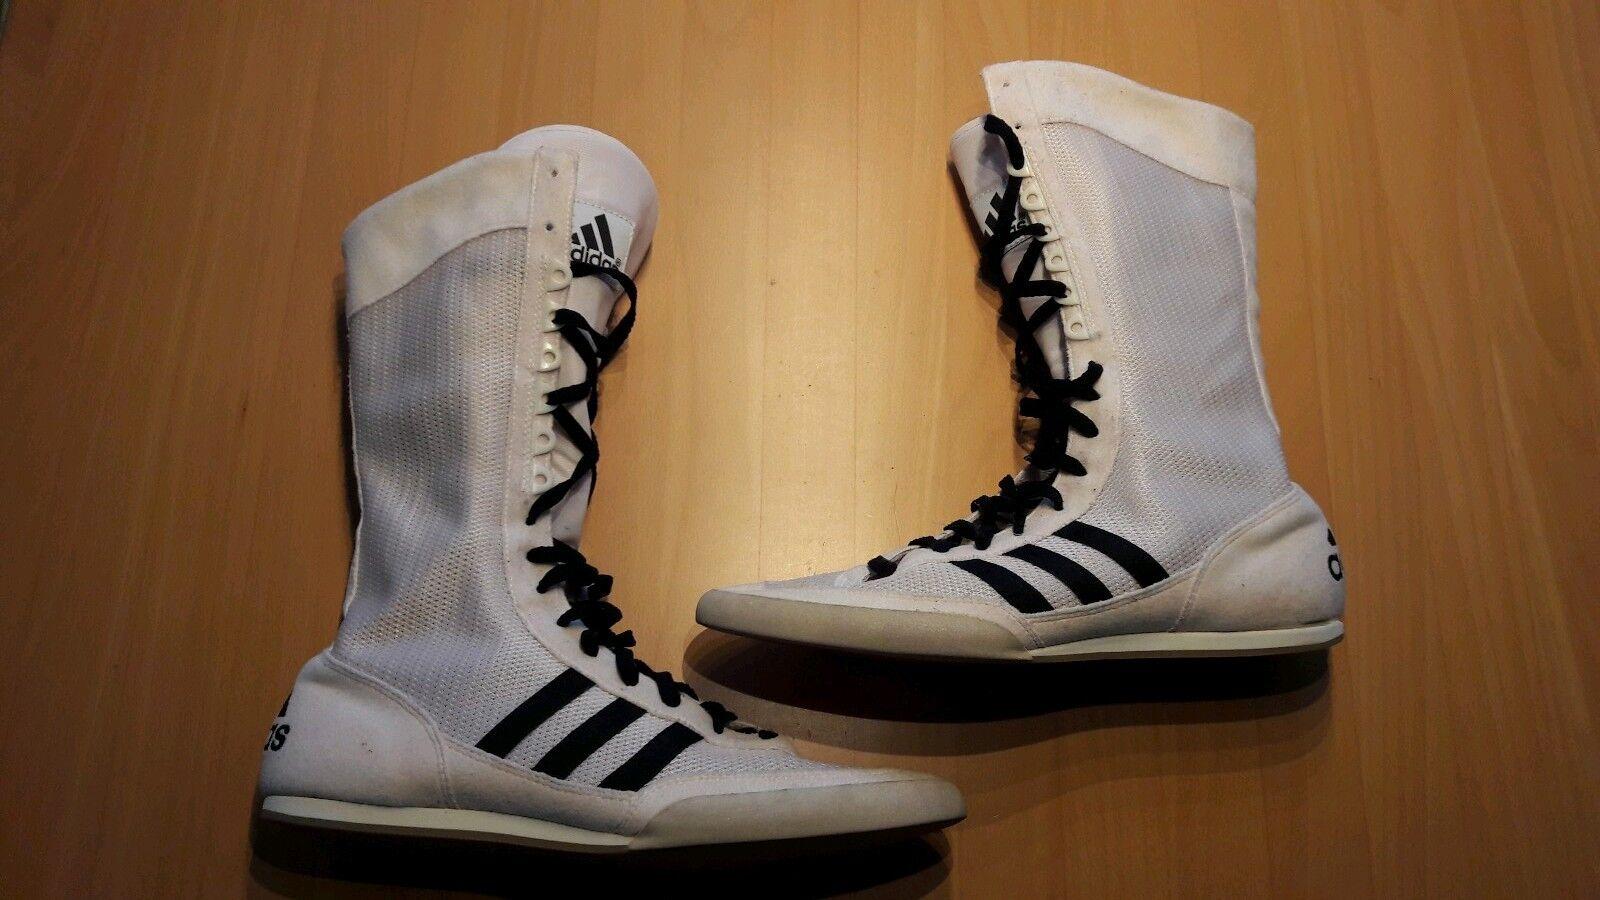 PUMA BOXING CHAMP boots Boxerstiefel Boxschuhe Boxhandschuhe